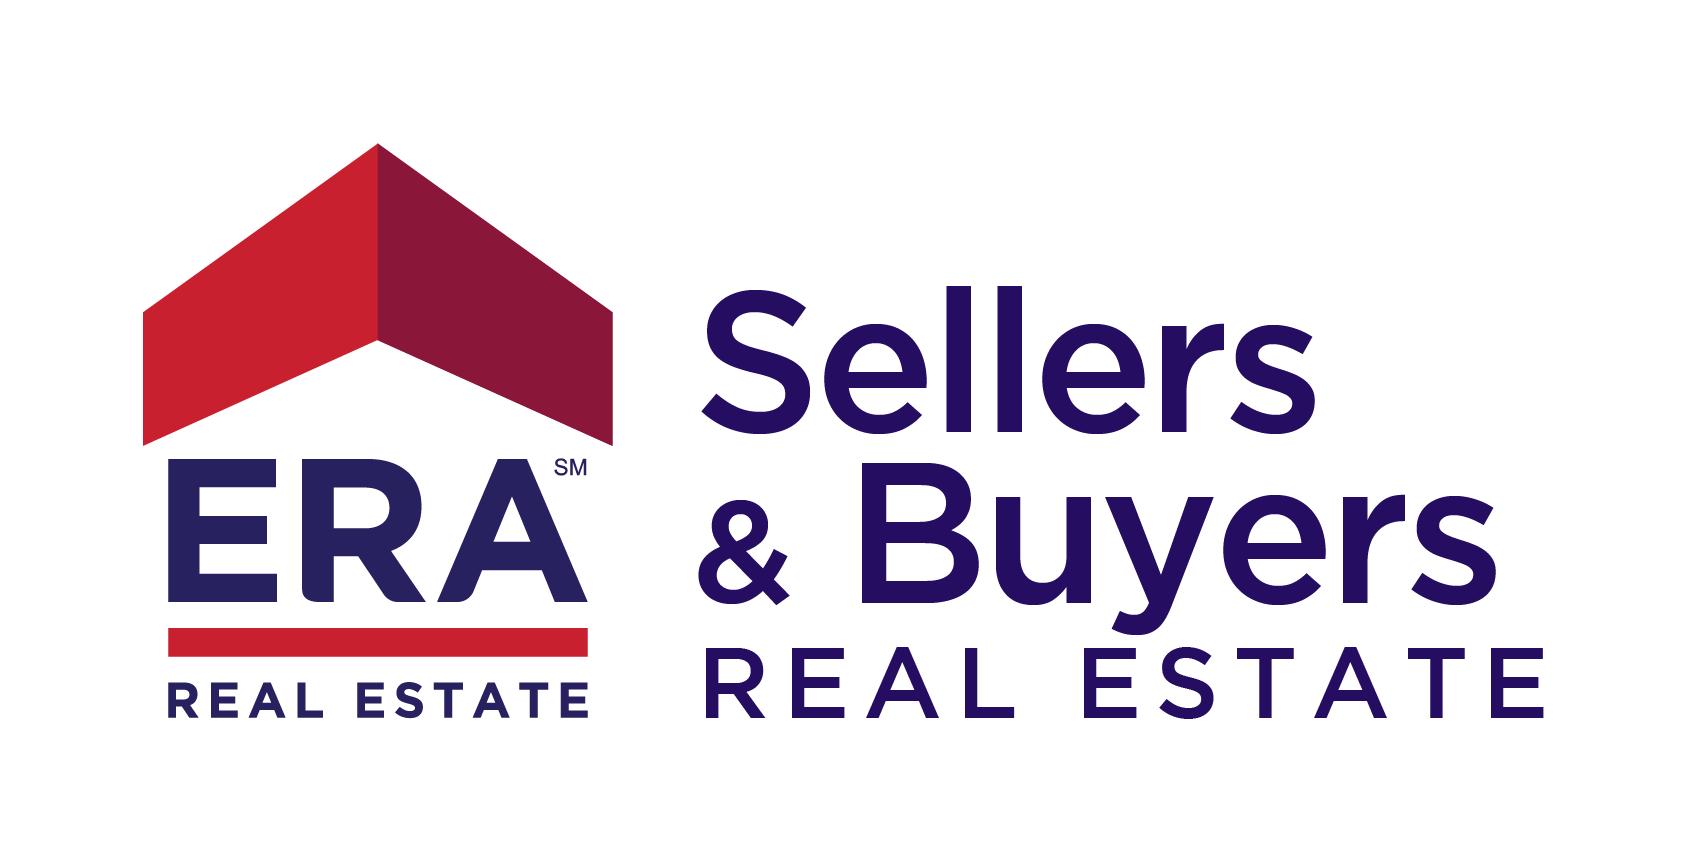 ERA Sellers & Buyers Real Estate Company Logo